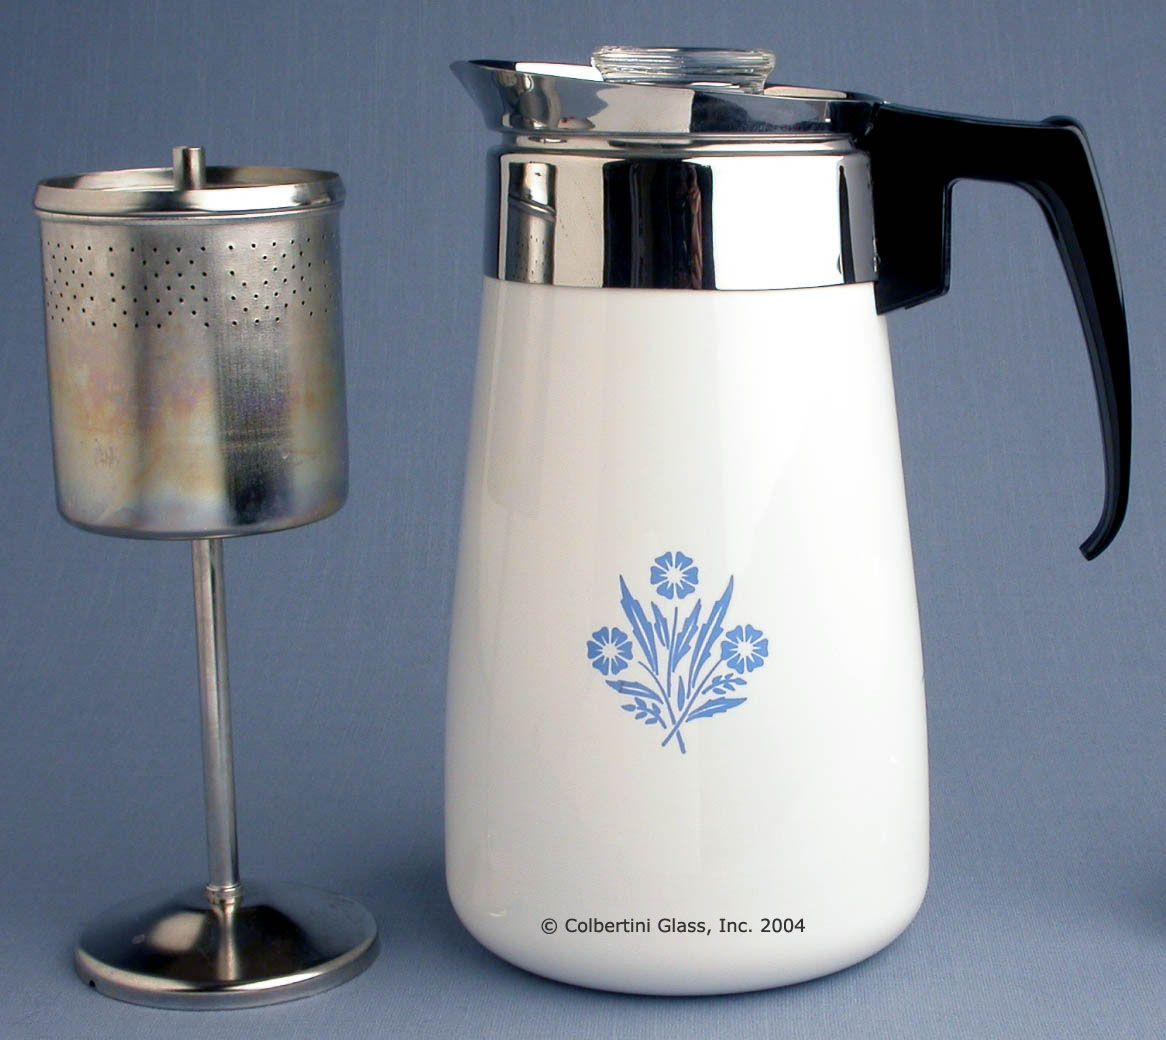 Pyrex Coffee Maker Vintage coffee pot, Cuisinart coffee